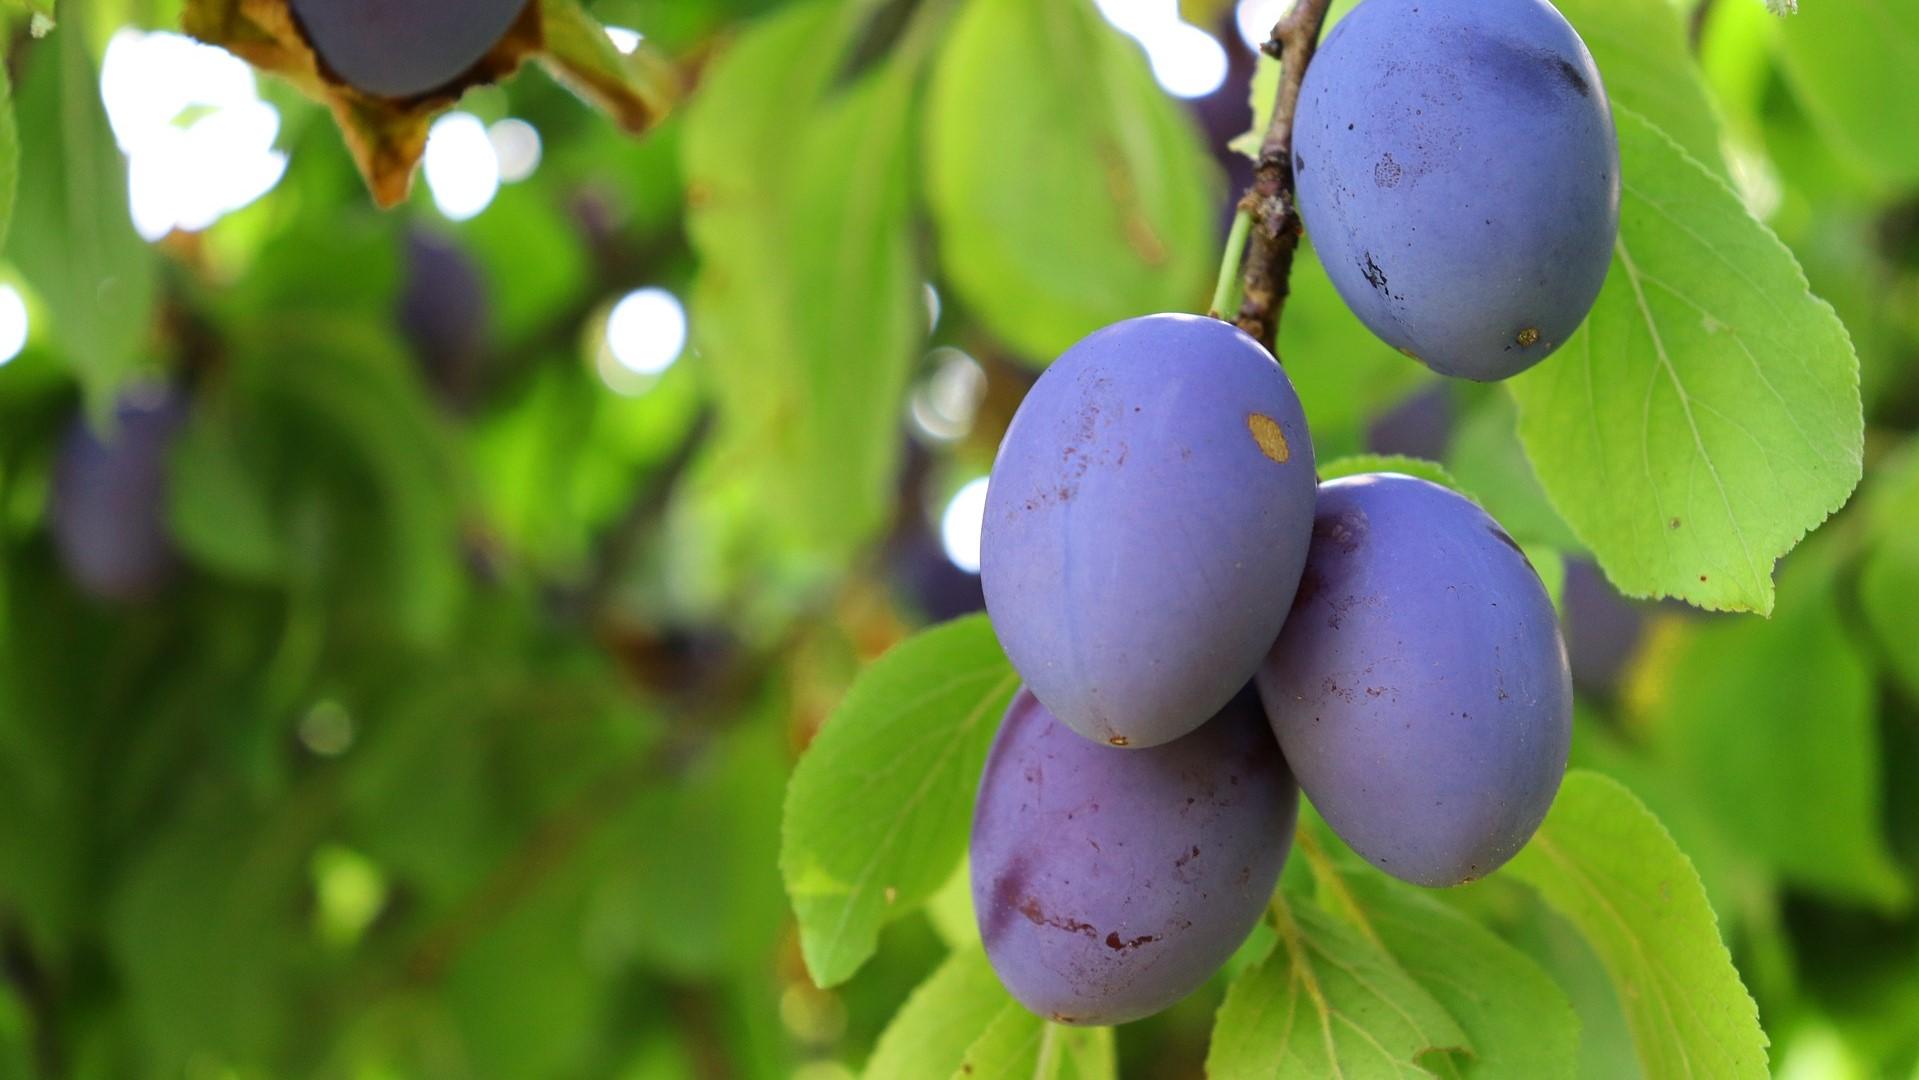 Attract Bees - flower - fruit - plum tree